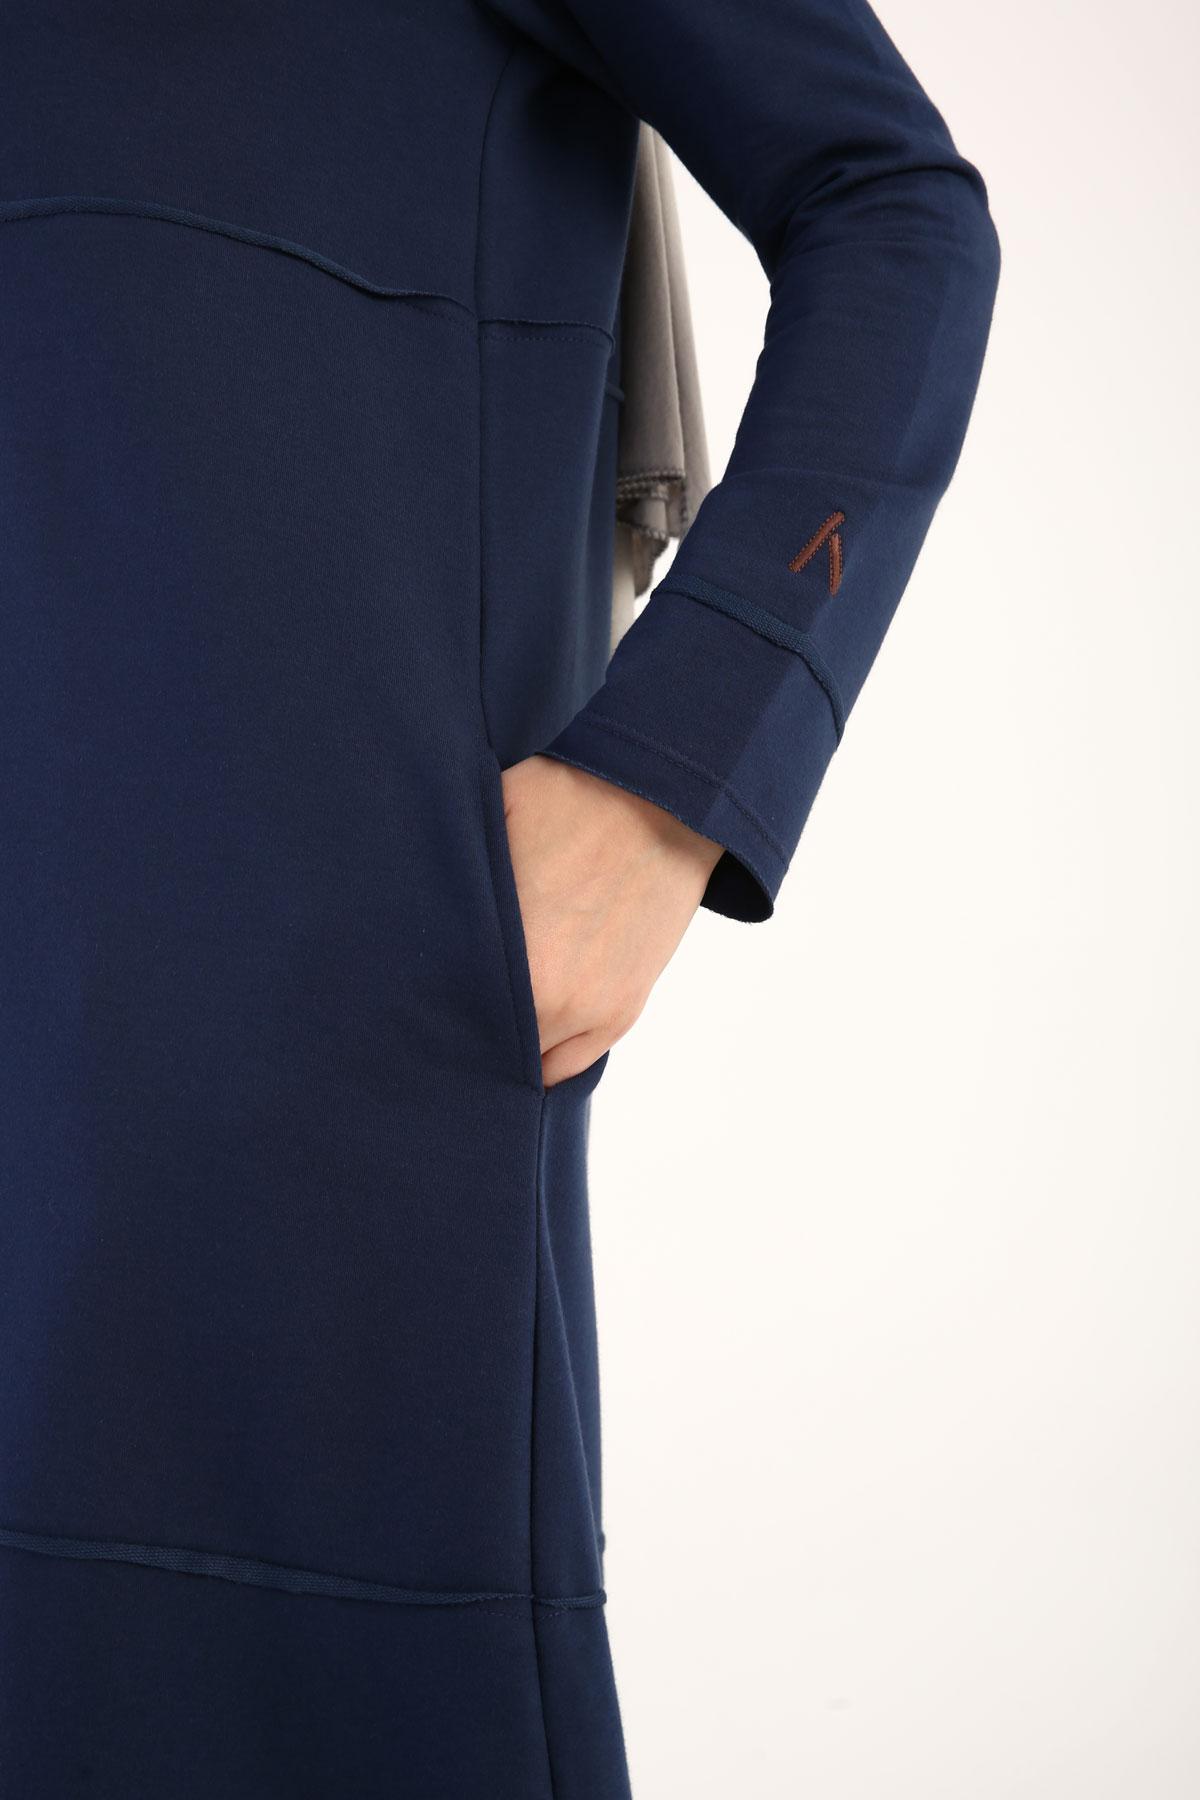 Comfy Plus Size Cardigan